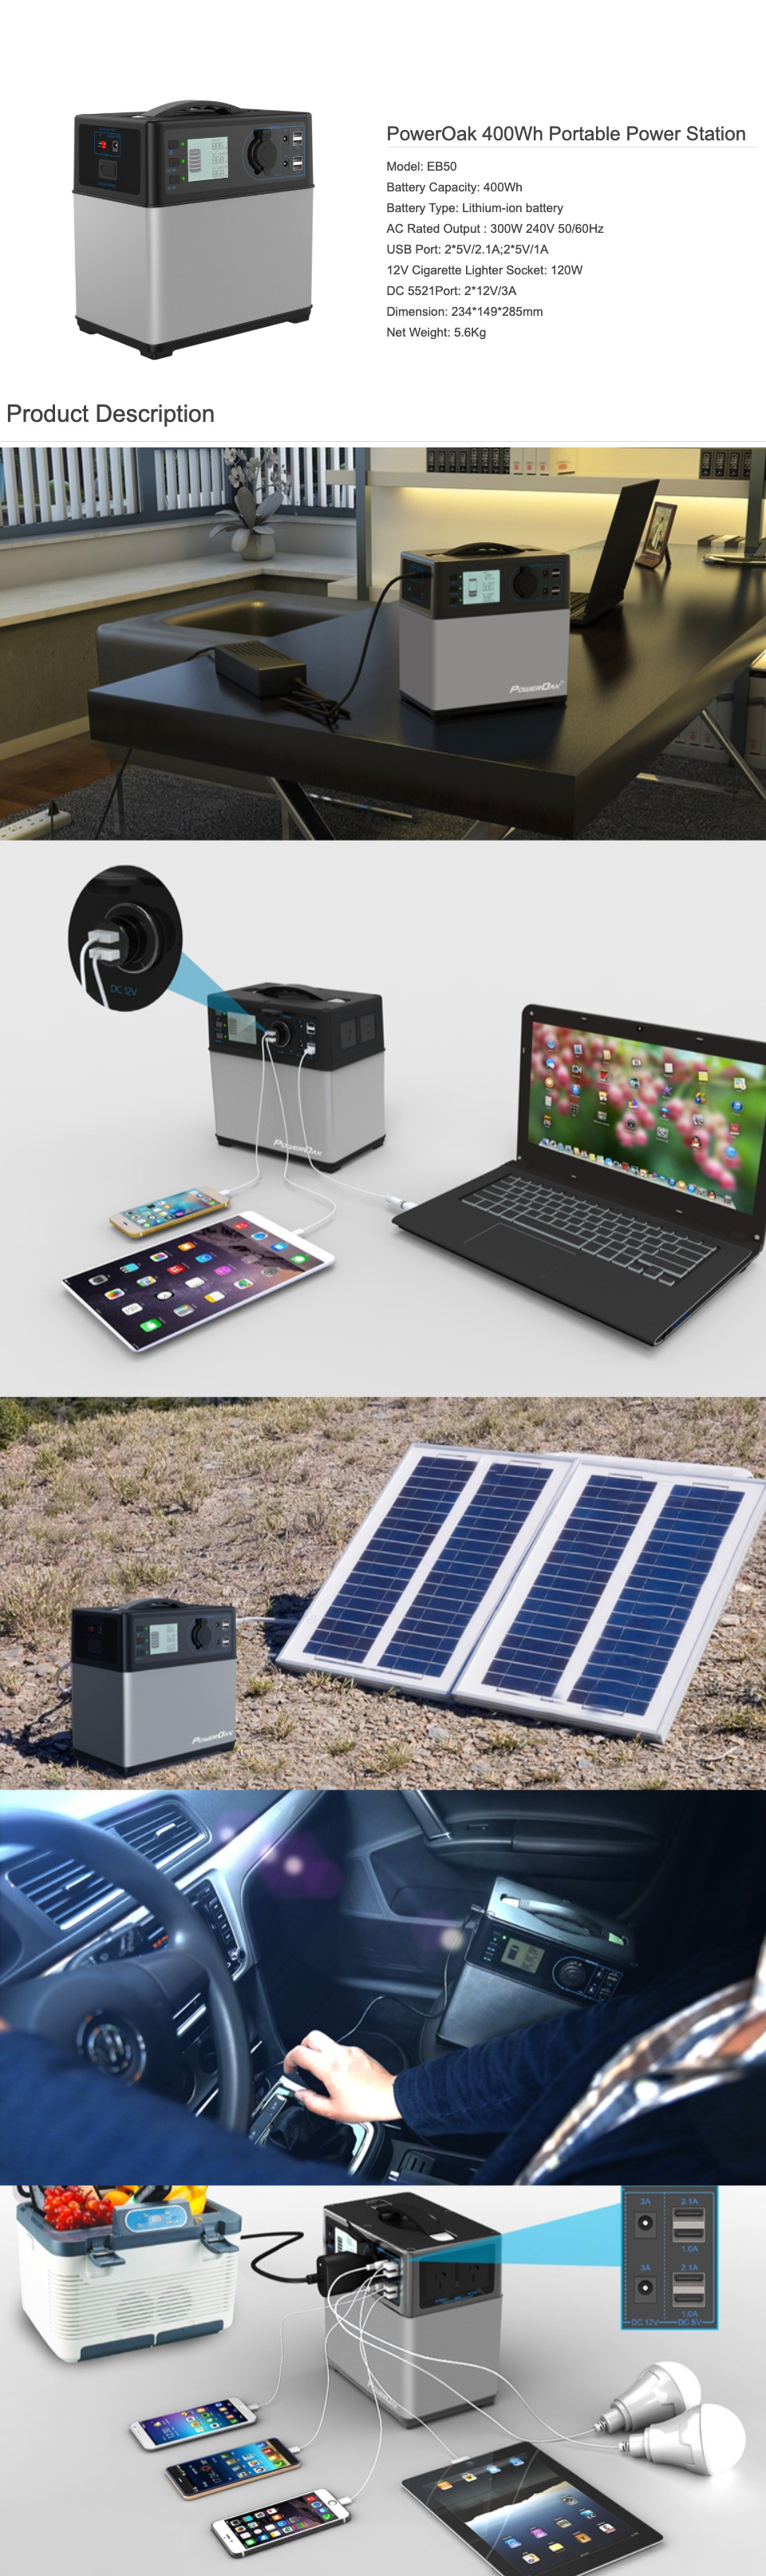 PowerOak EB50 400Wh Portable Power Station features